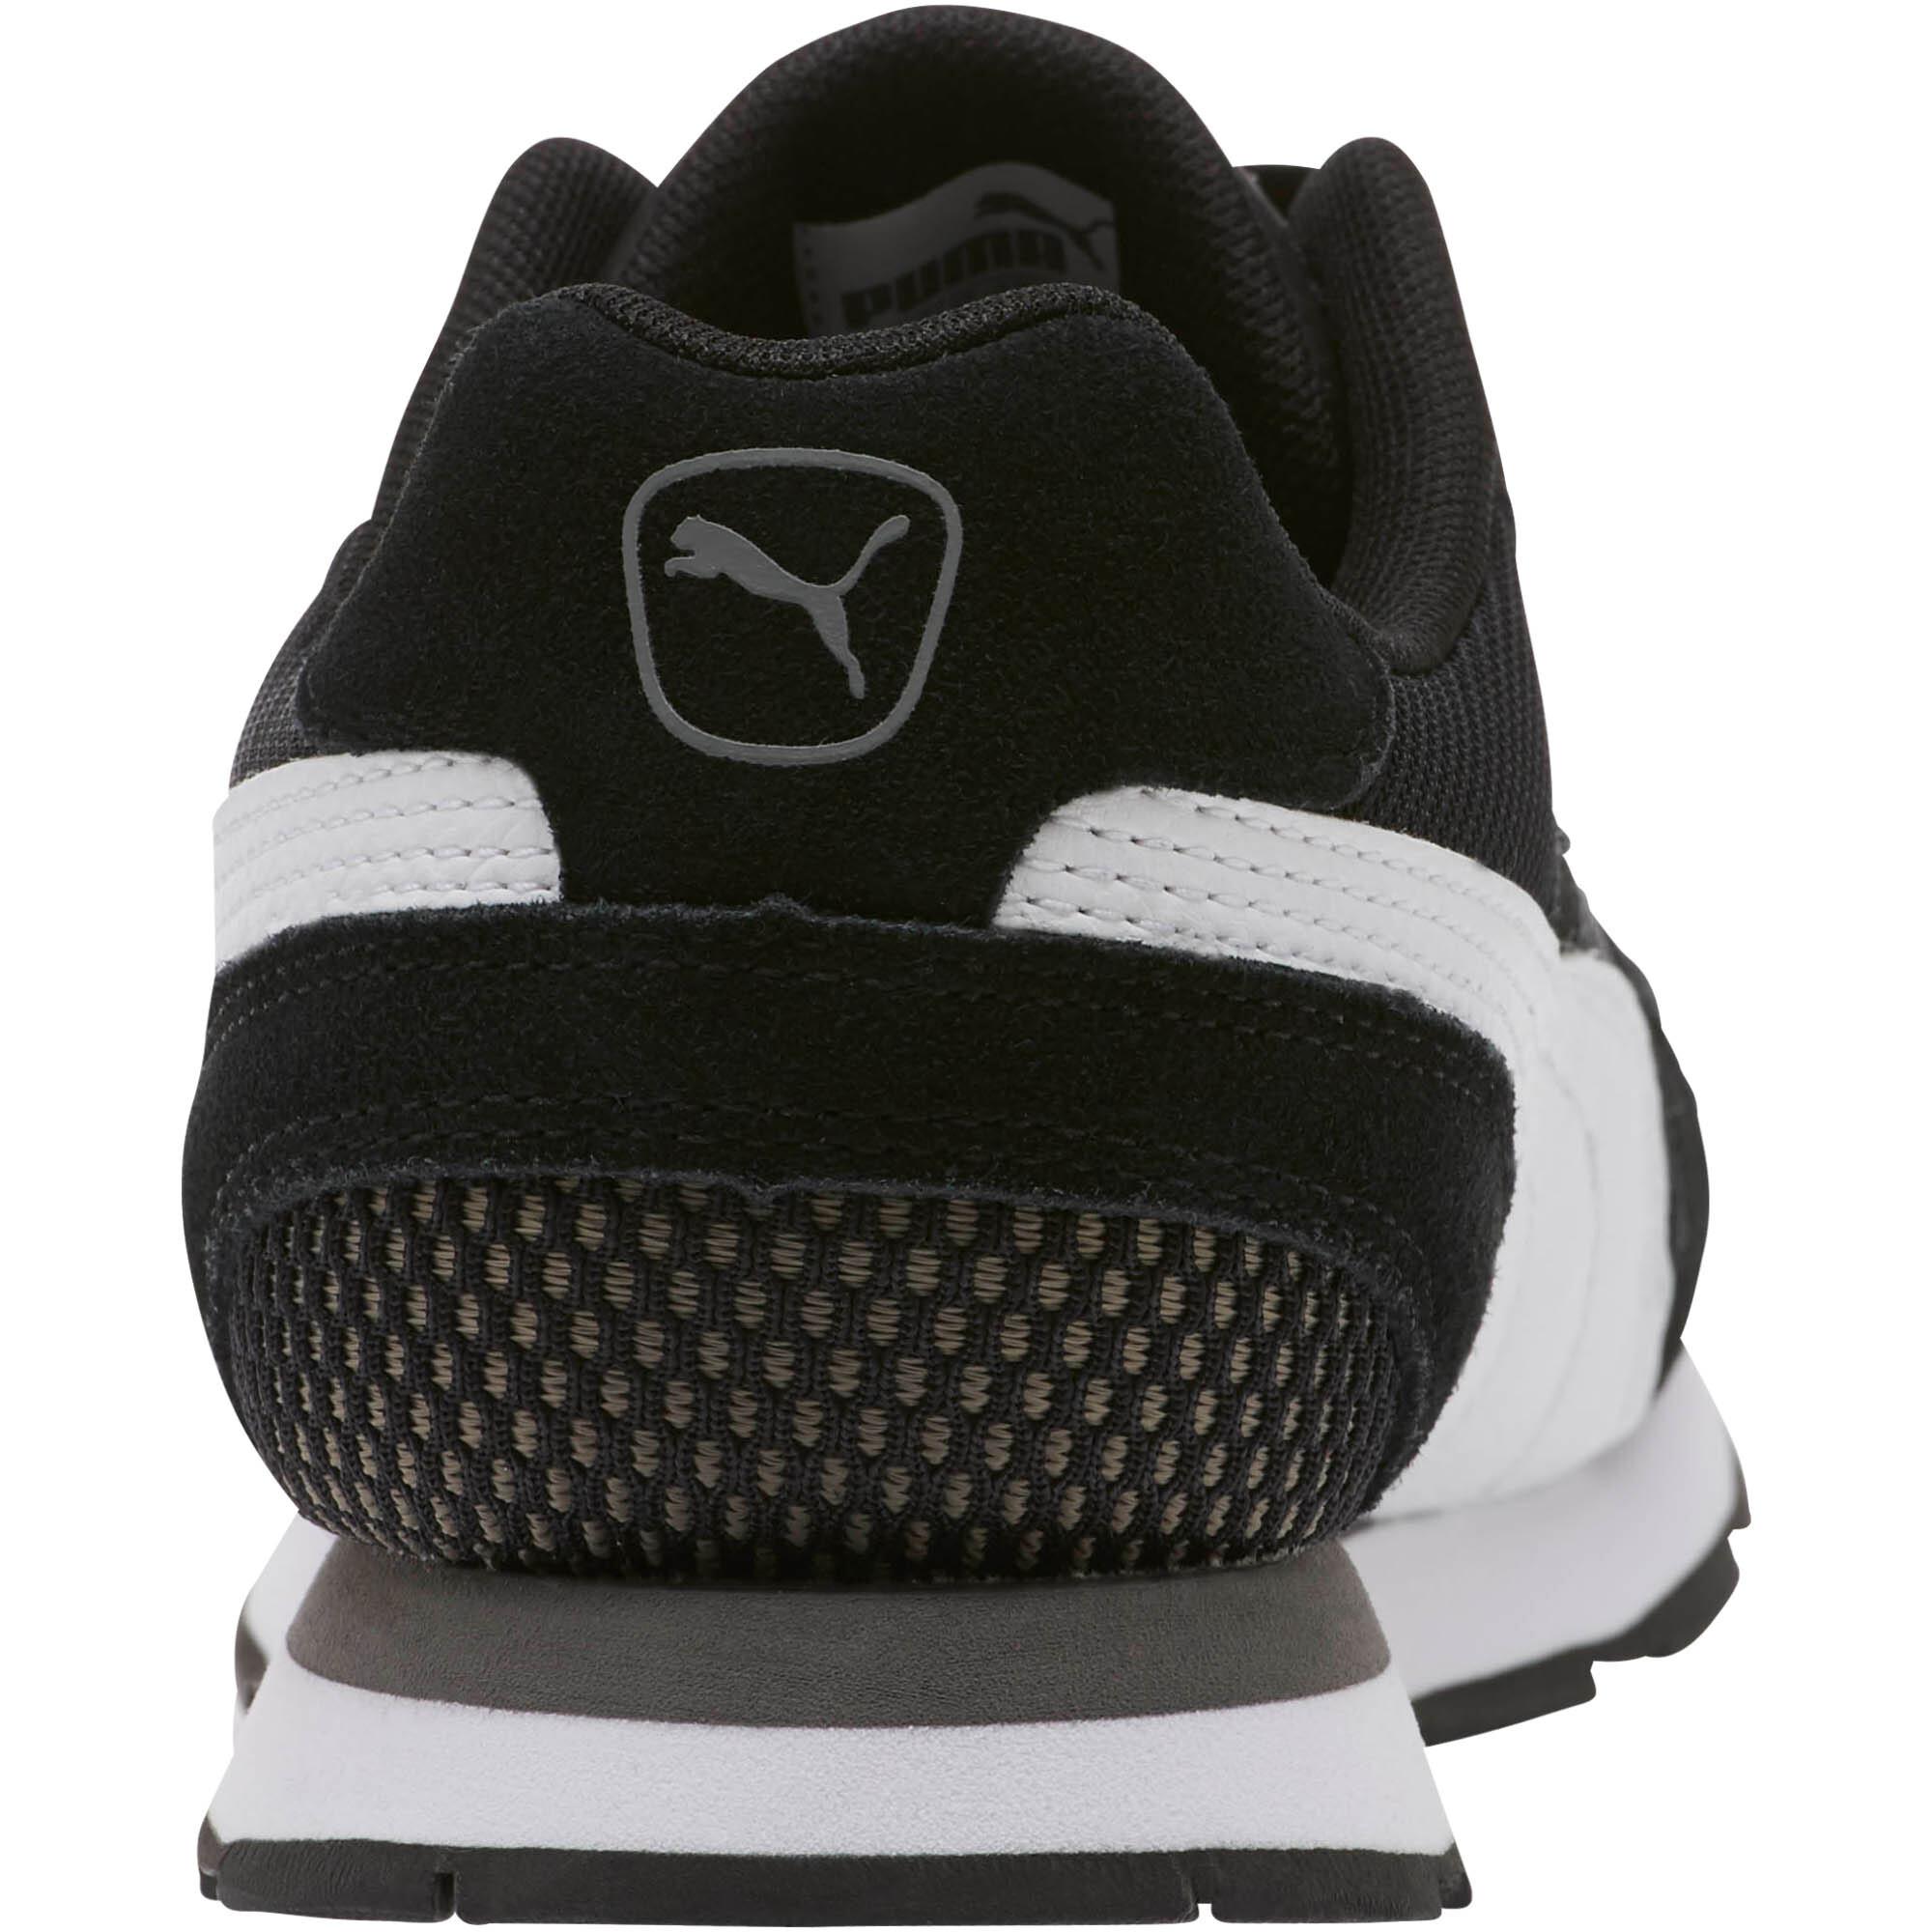 PUMA-Vista-Women-s-Sneakers-Women-Shoe-Basics thumbnail 3